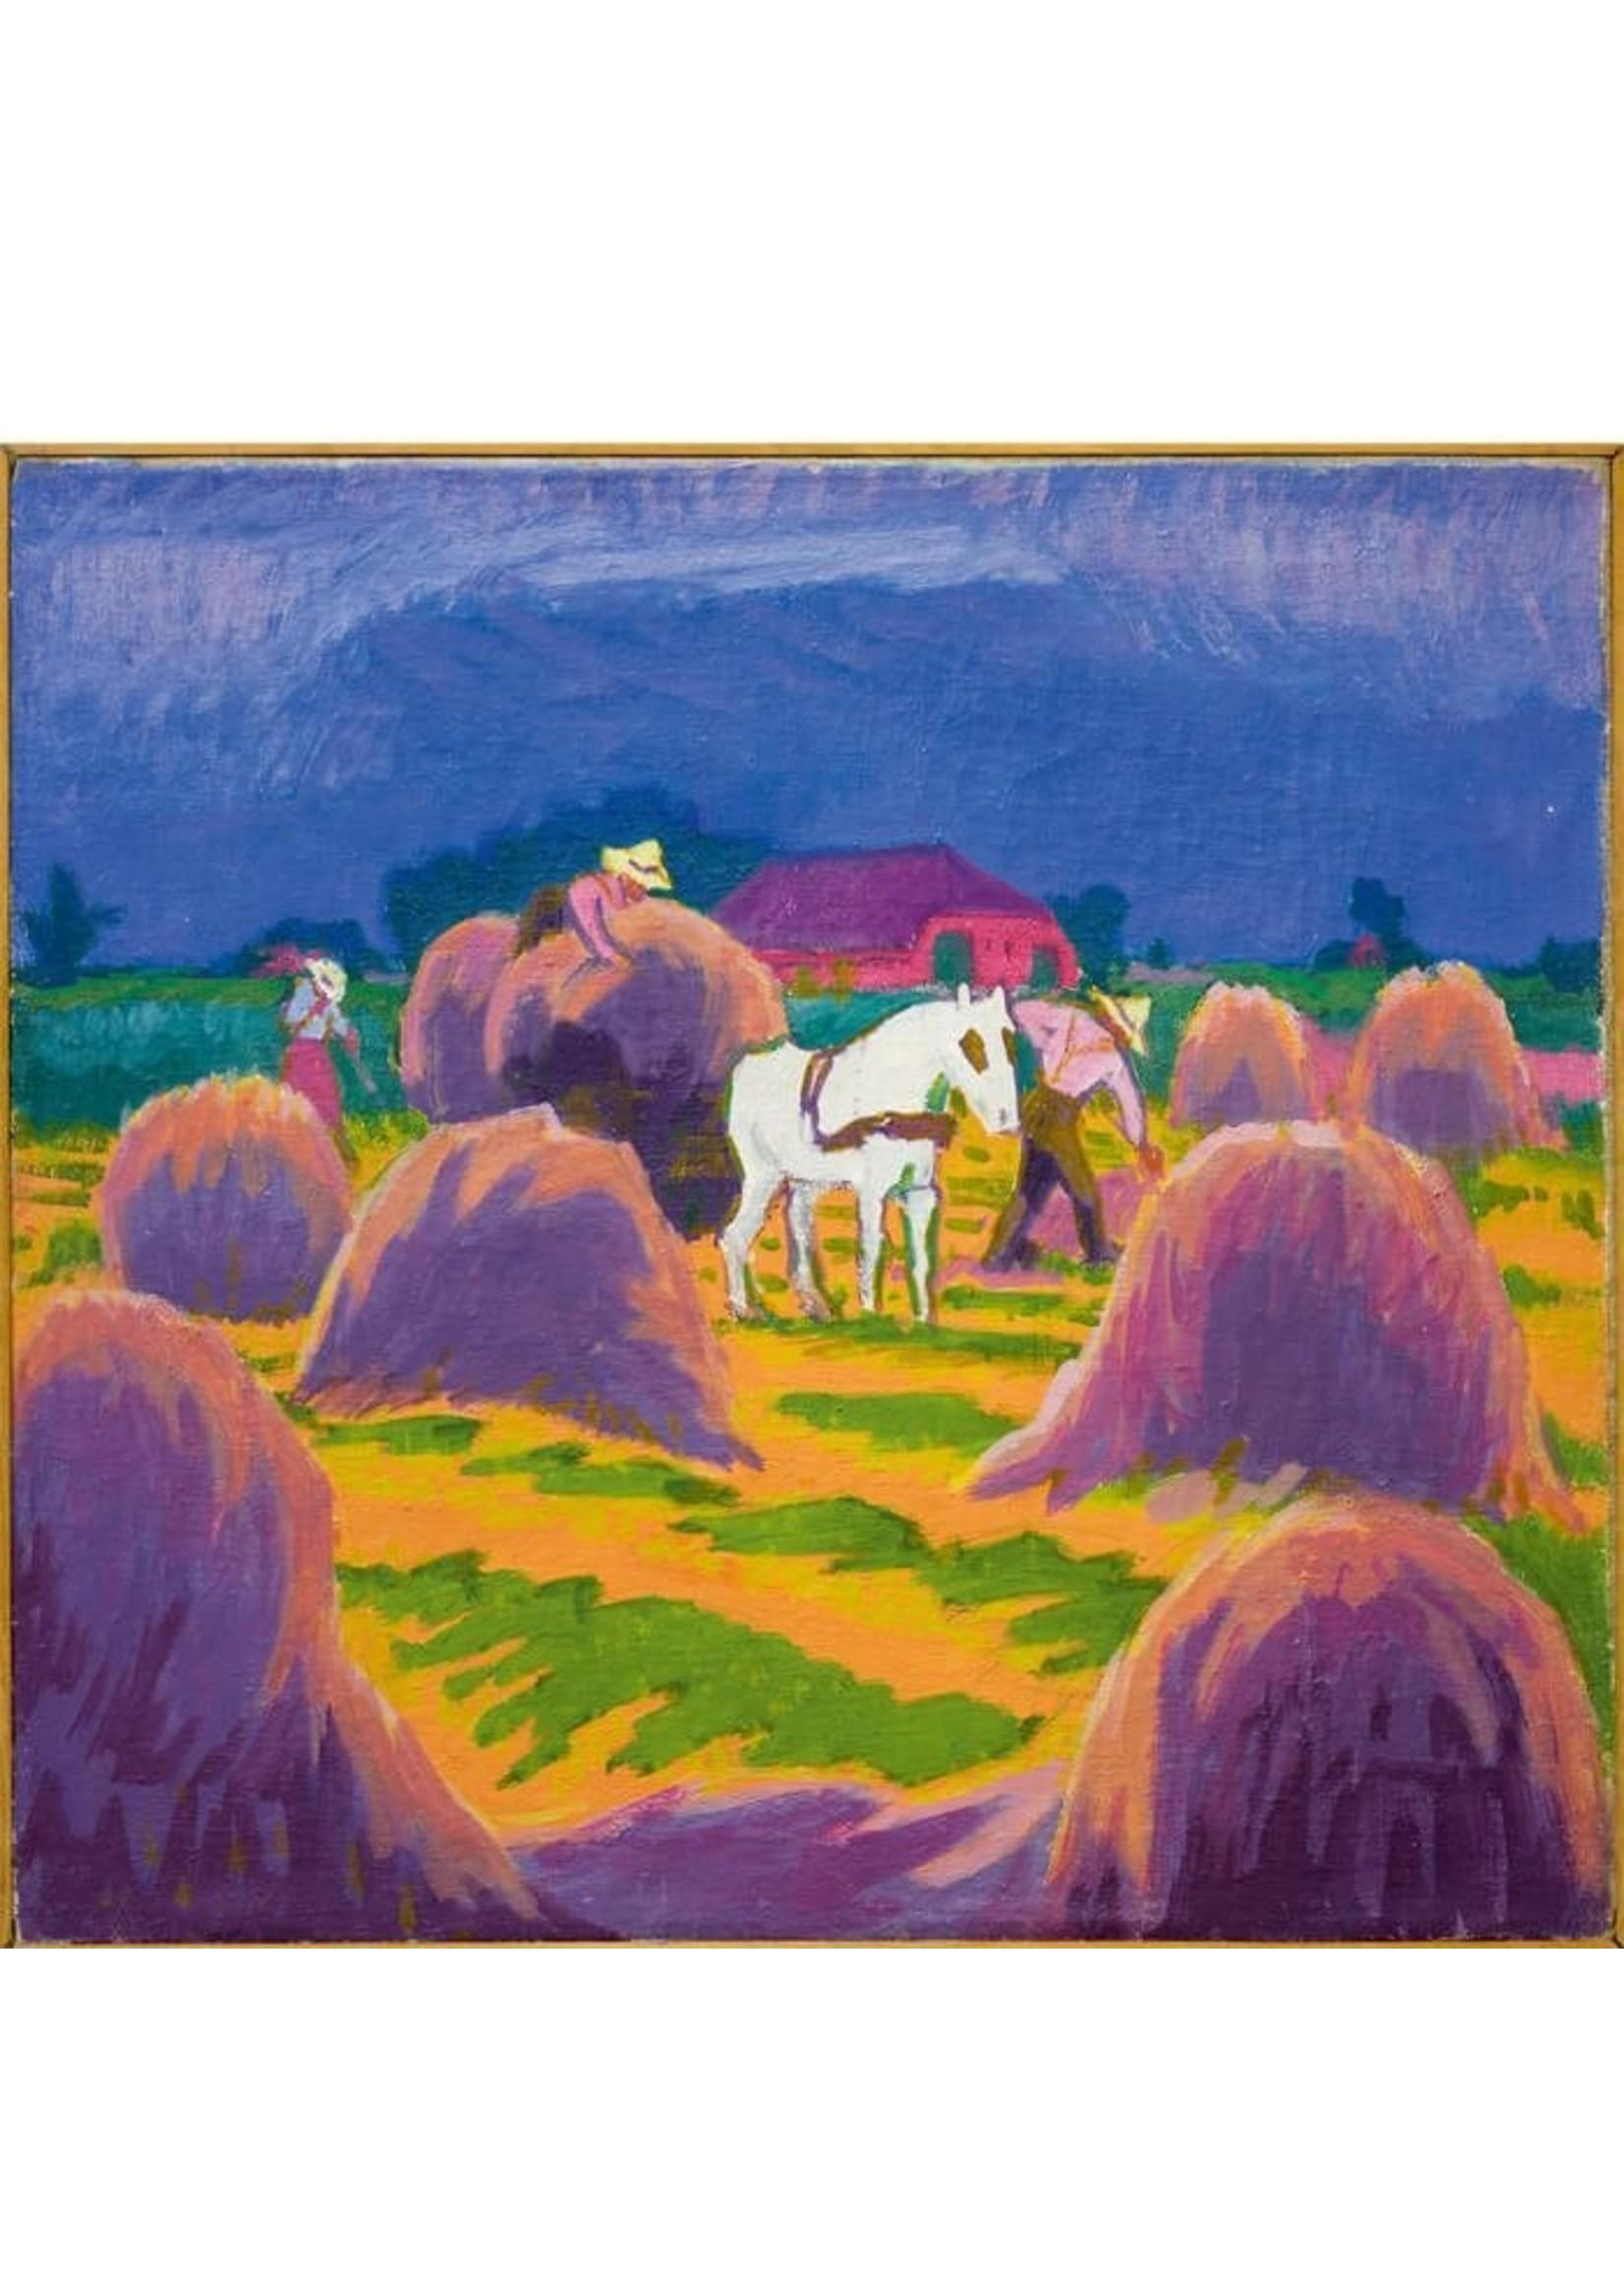 Die Maler von De Ploeg